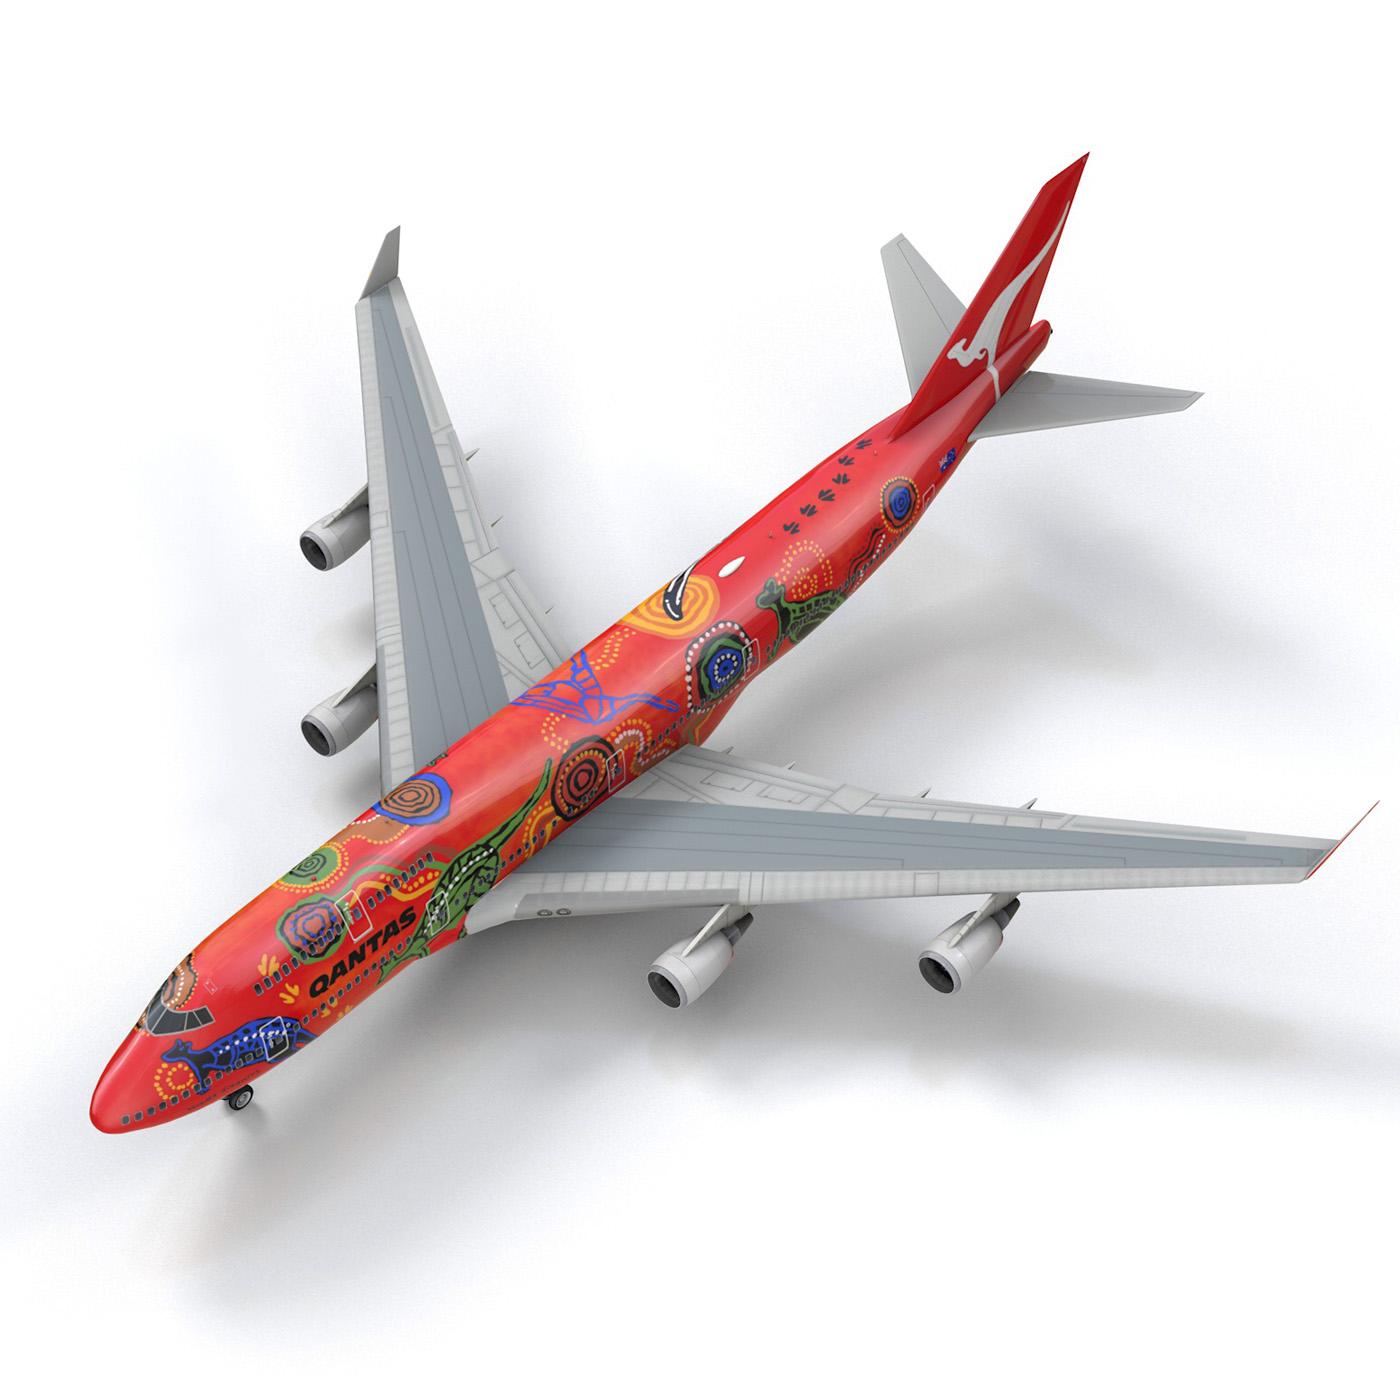 boeing 747 qantas wunala dreaming 3d model 3ds fbx c4d lwo obj 281795